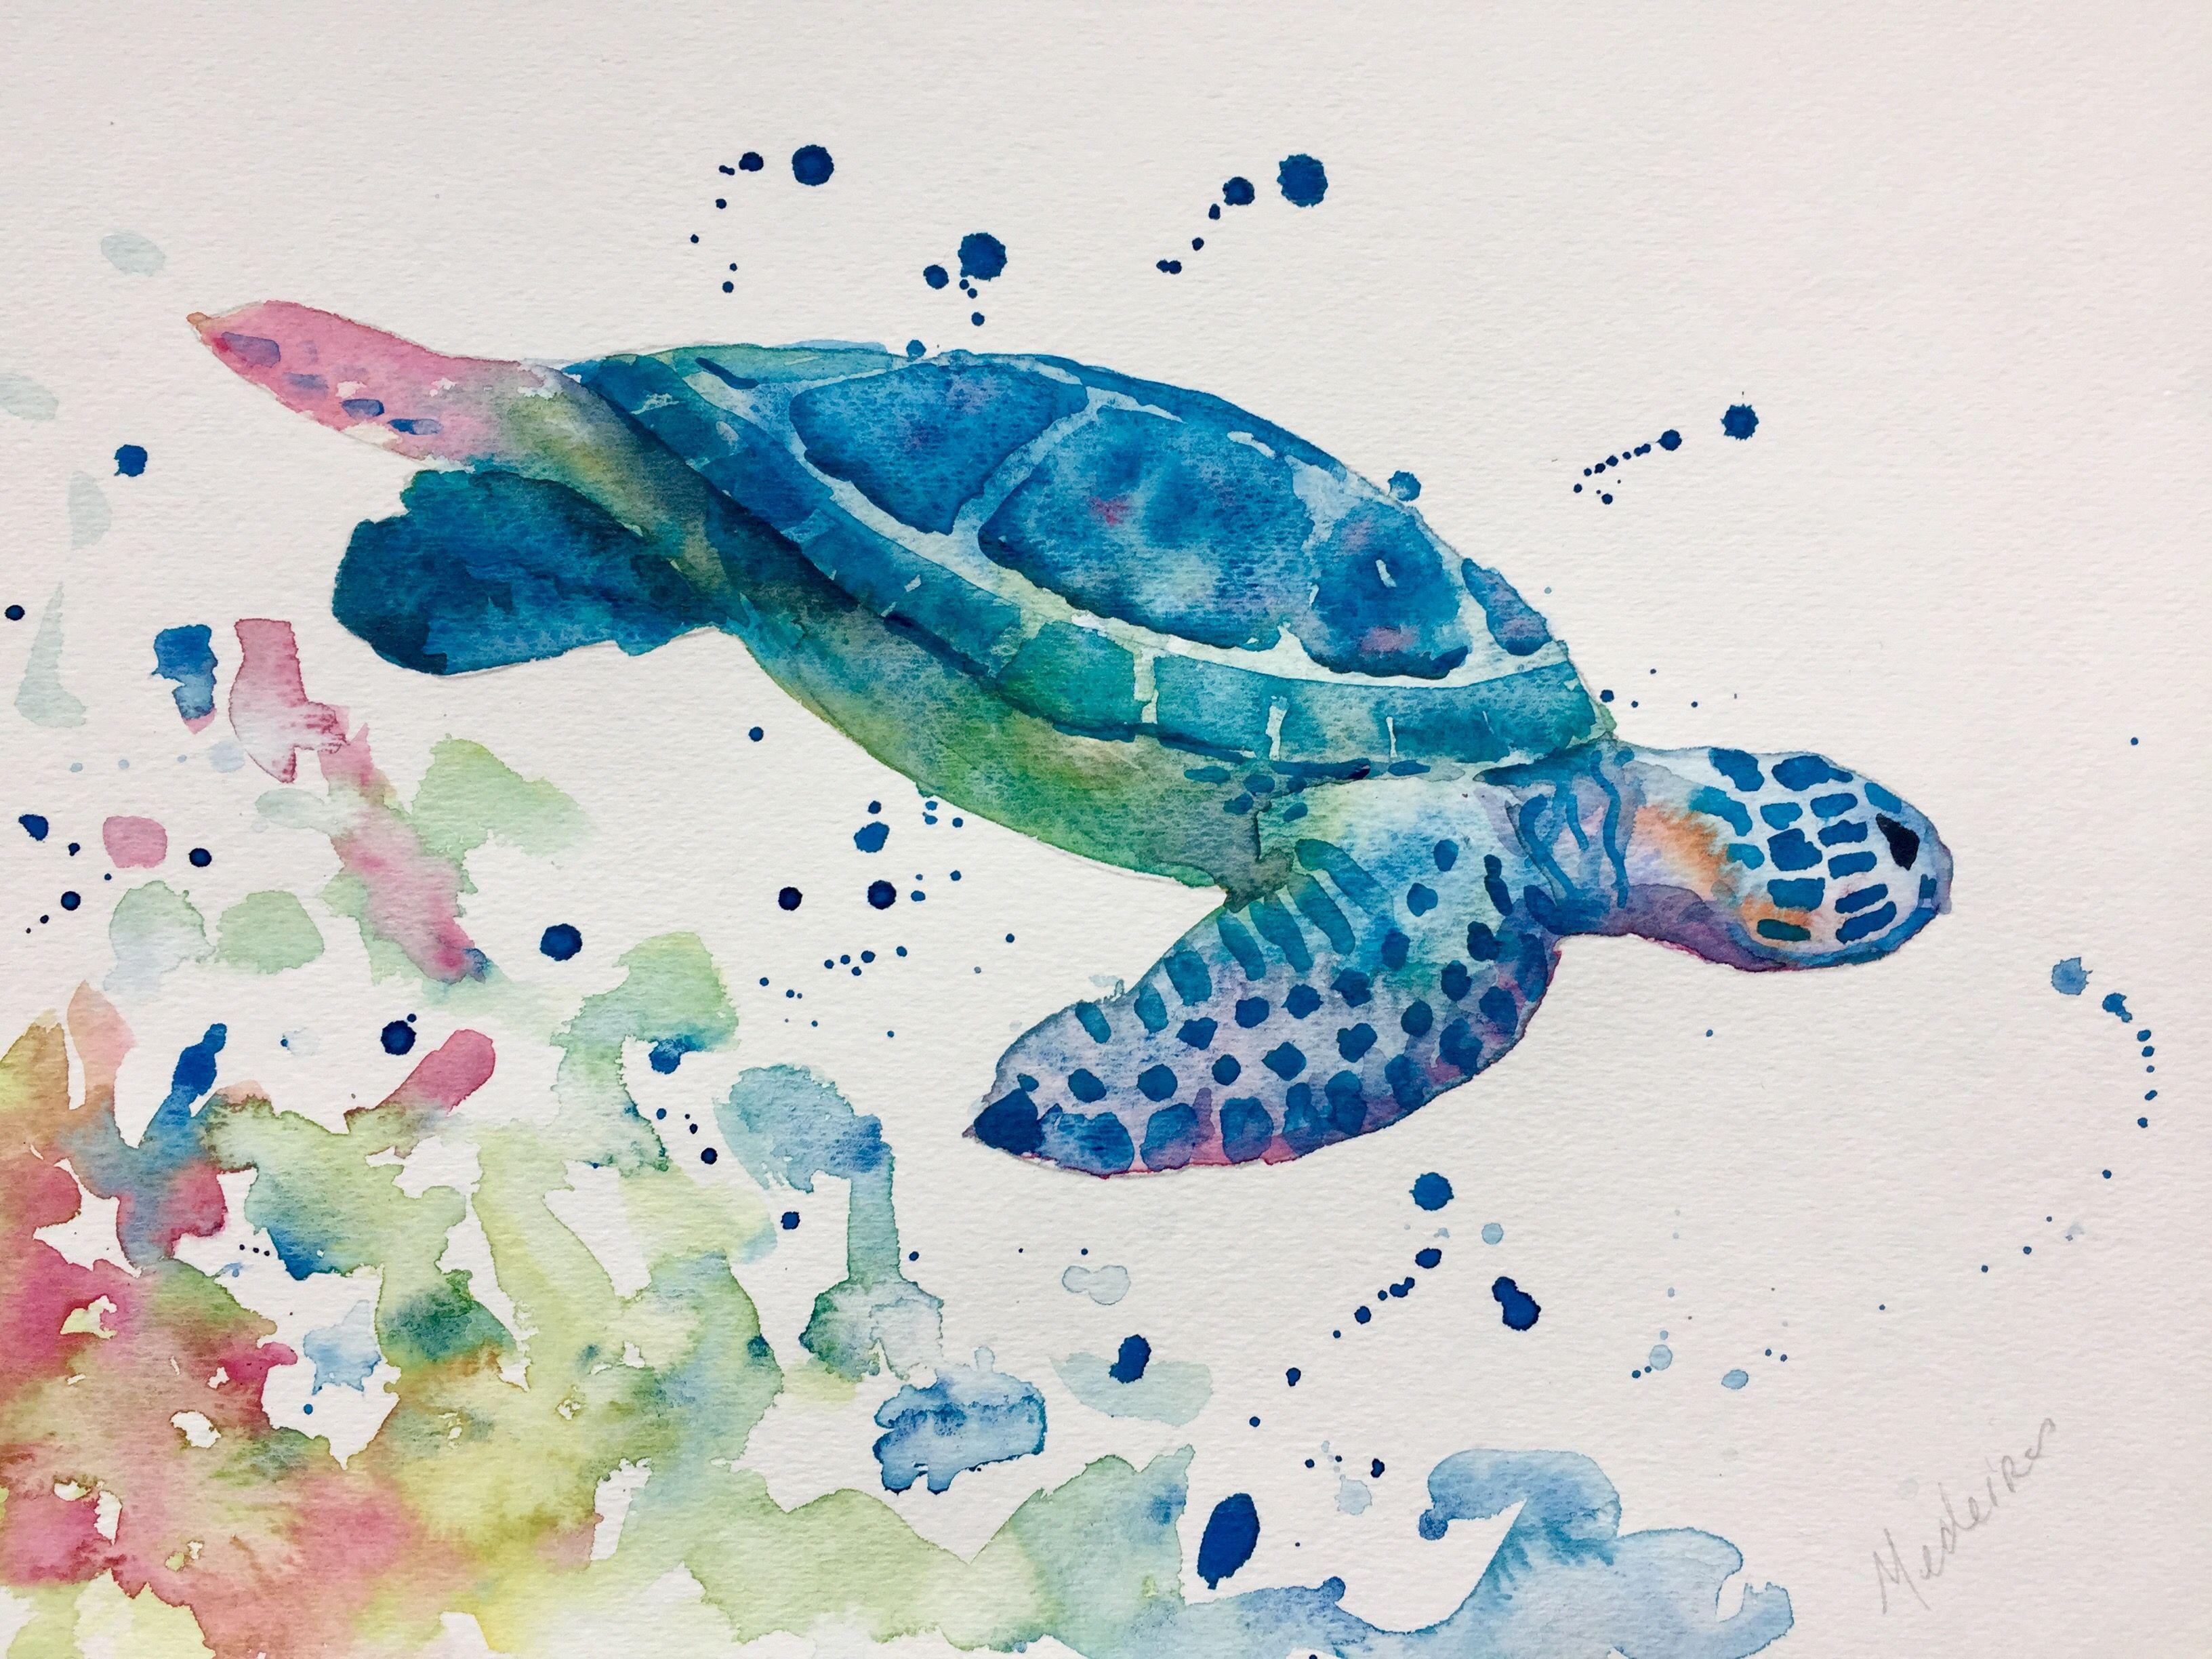 Watercolor Turtle Turtle Painting Turtle Watercolor Watercolor